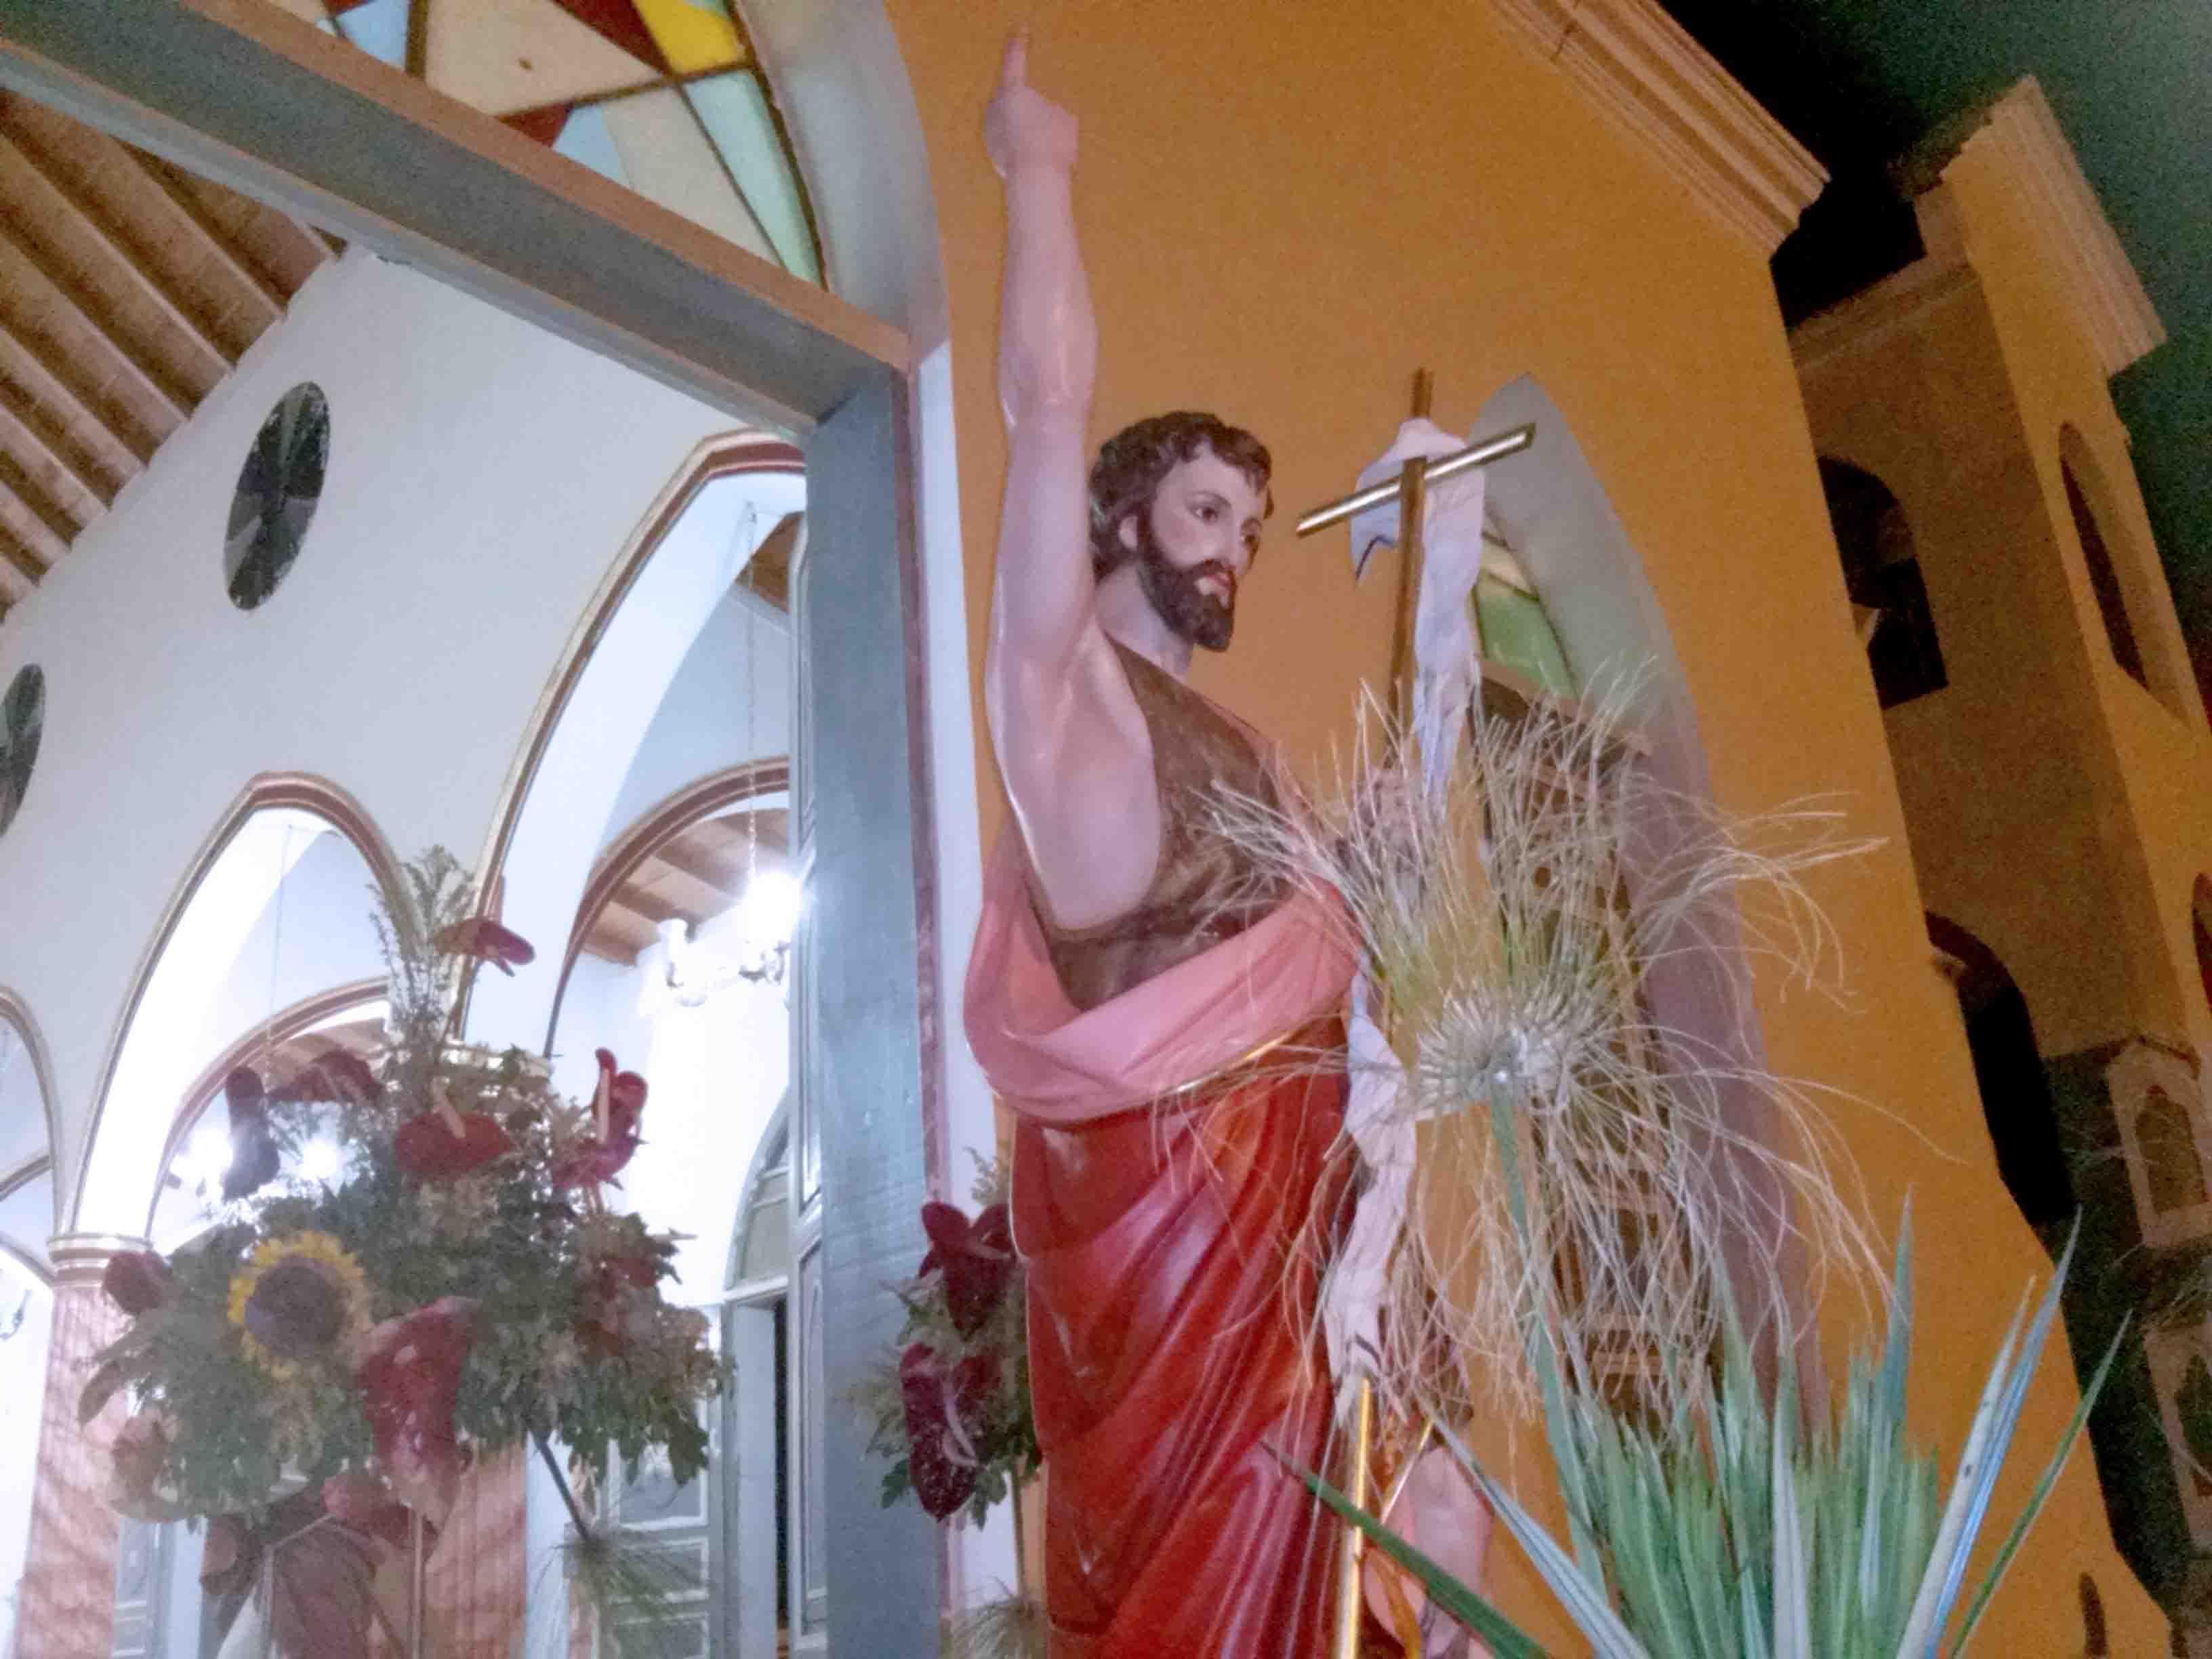 CELEBRADA EN YAGUARAPARO FESTIVIDAD EN HONOR A SAN JUAN BAUTISTA